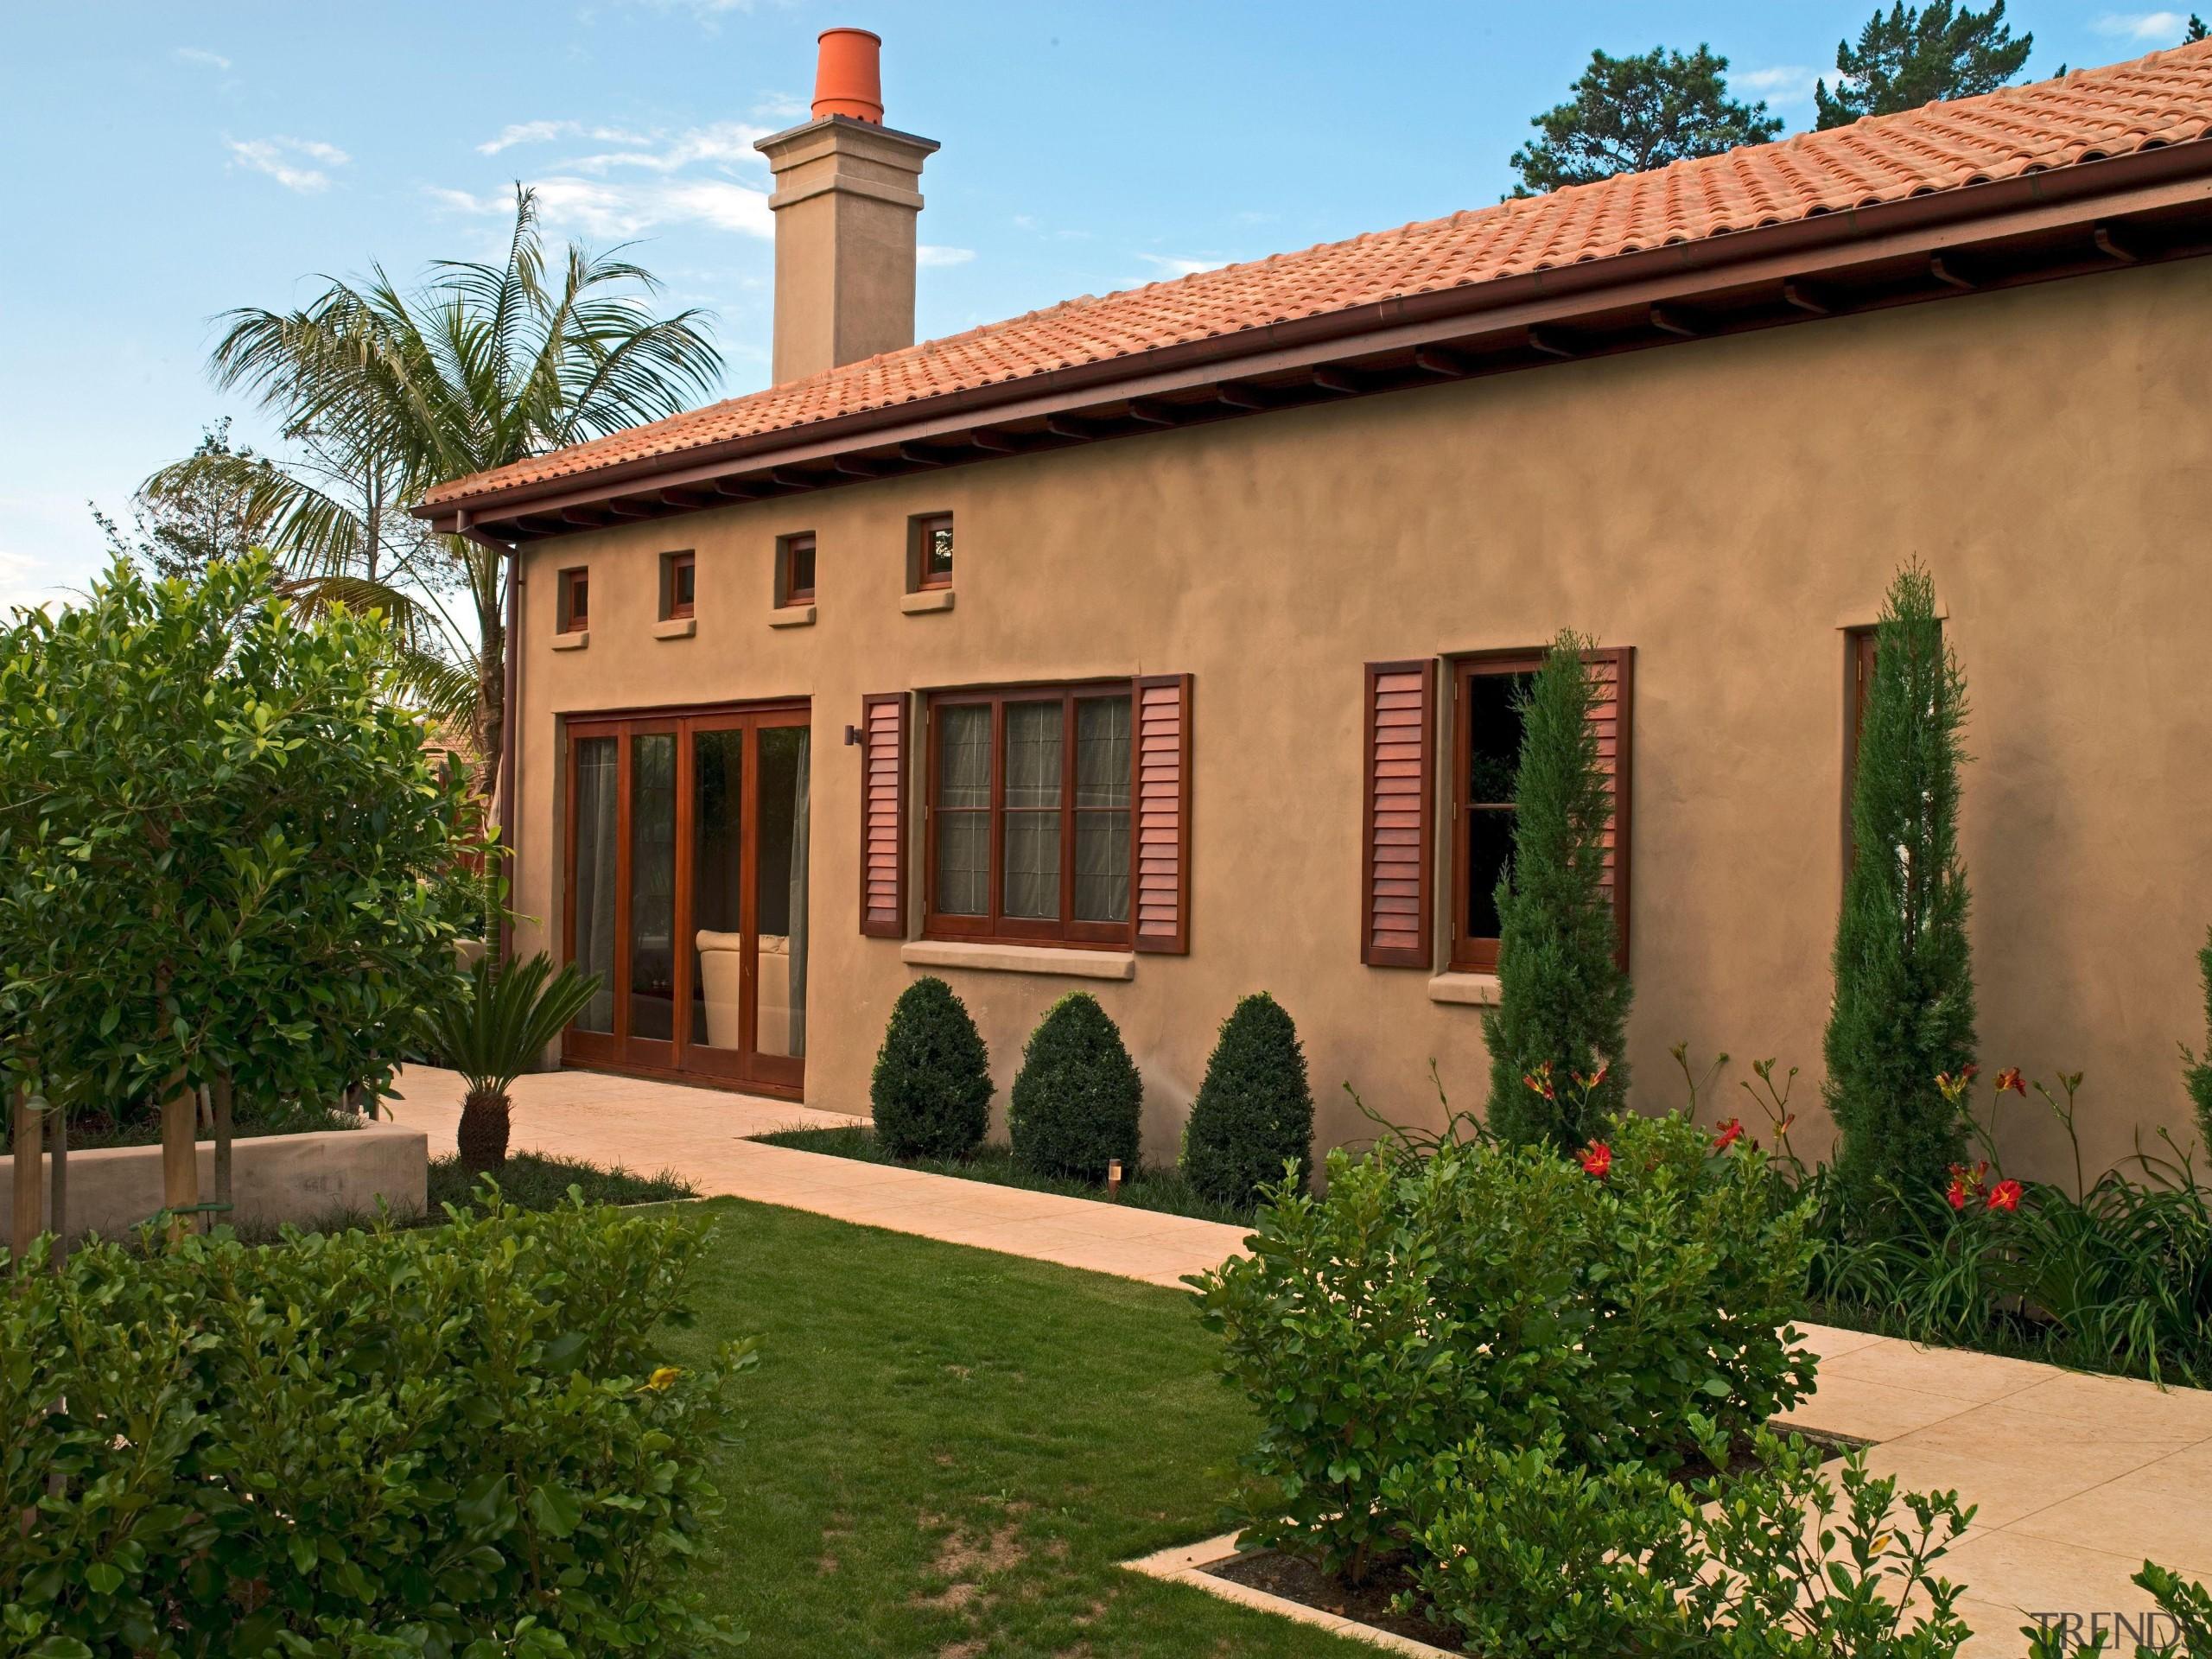 Onetaunga - cottage | estate | facade | cottage, estate, facade, hacienda, home, house, mansion, property, real estate, villa, window, brown